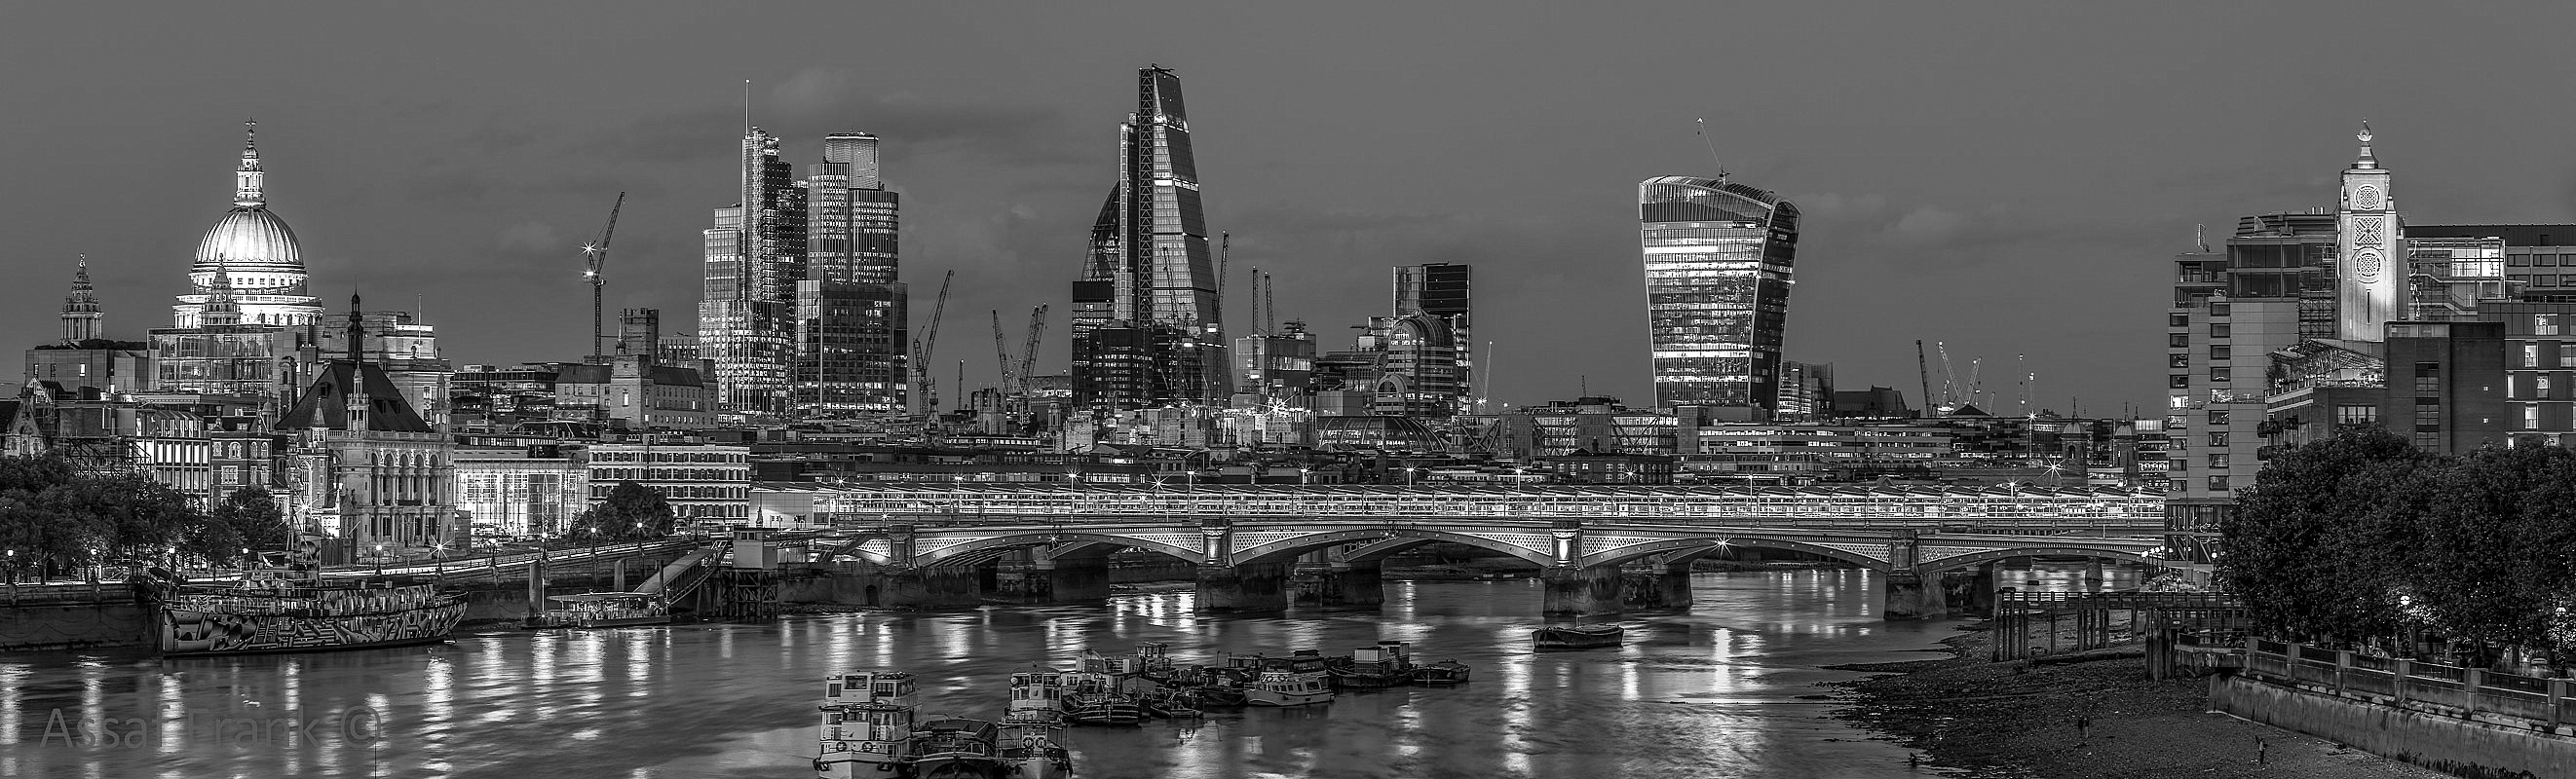 Evening view of Blackfriars  by Assaf Frank